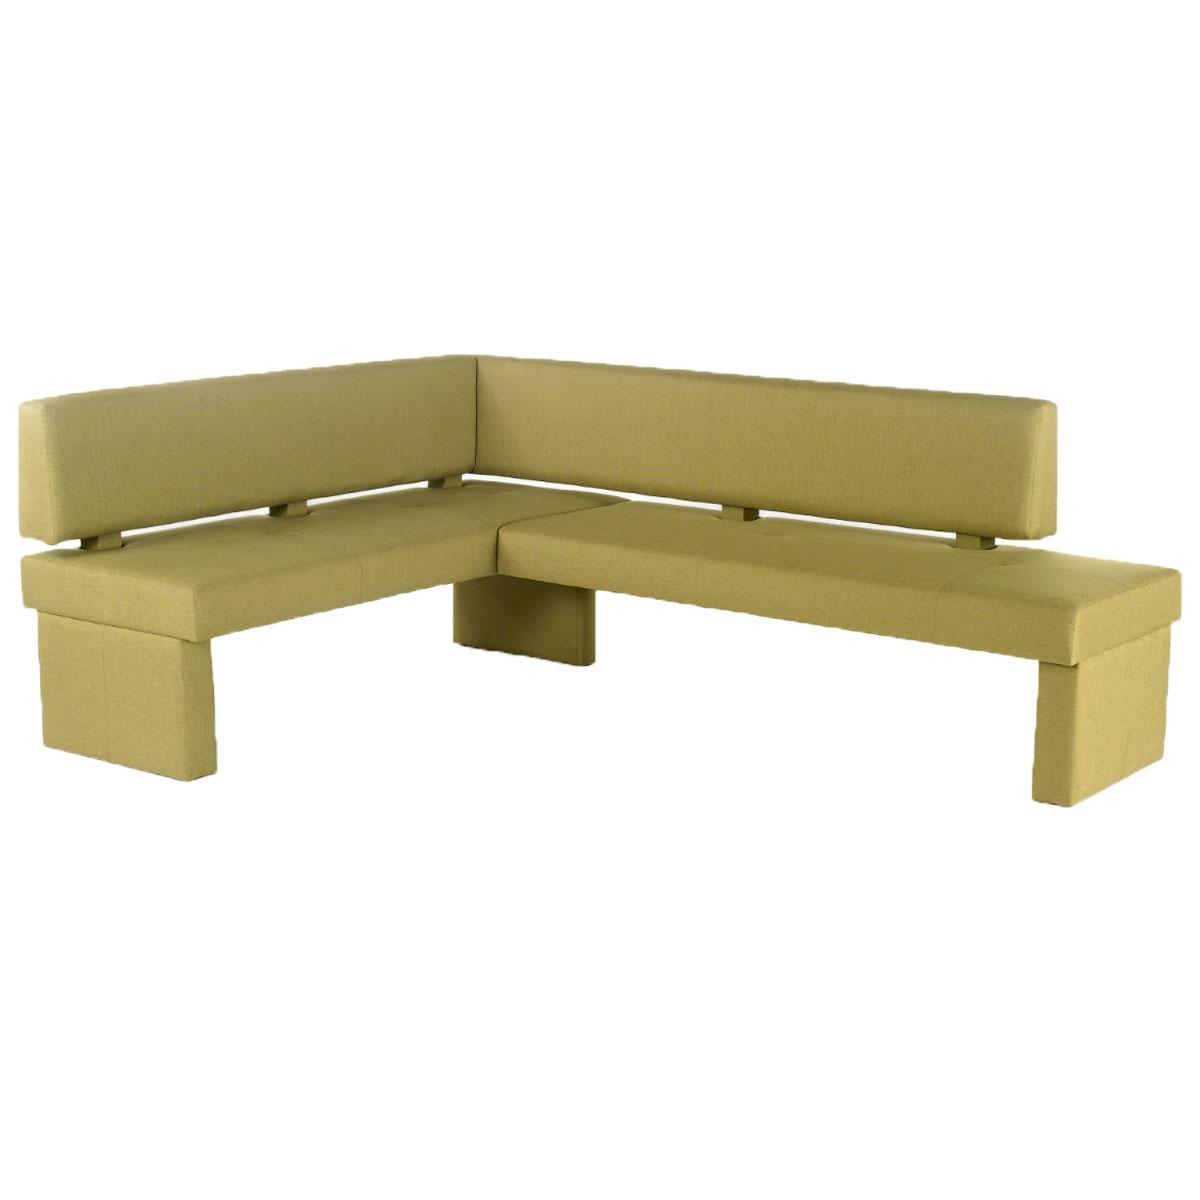 Standard Furniture Polsterbank Domino Mit Stoffbezug Eckbank Bank